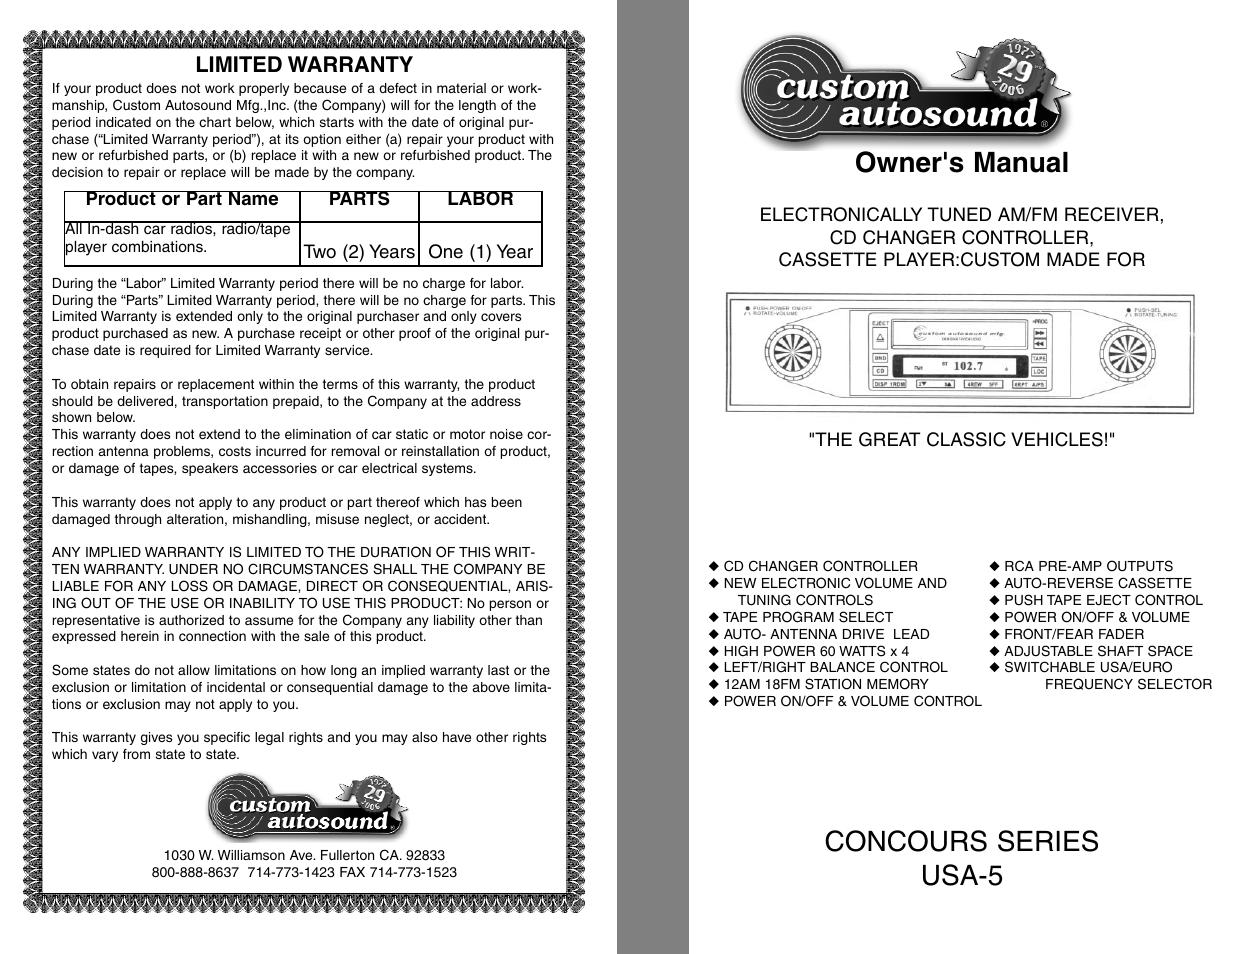 Custom Autosound Usa